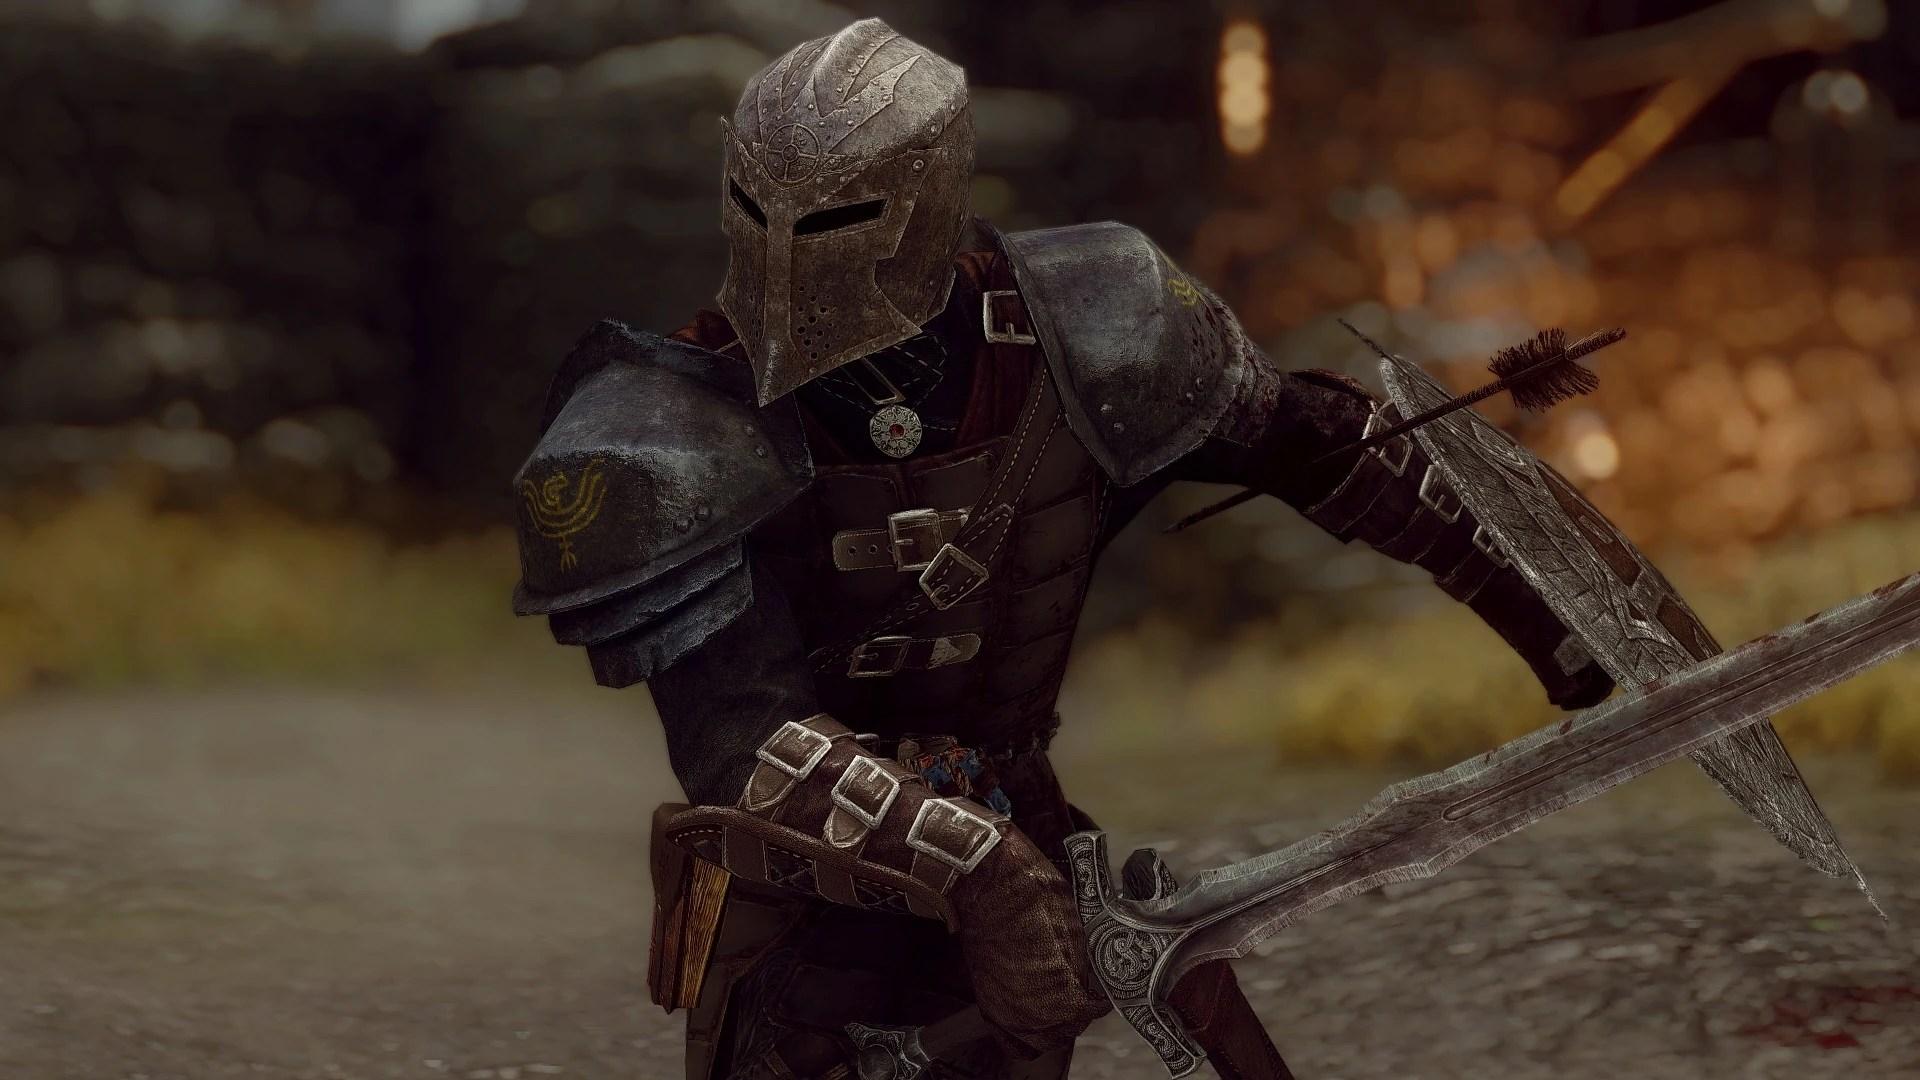 Total War Warhammer Wallpaper Hd Dawn Of The Dawnguard Armor At Skyrim Nexus Mods And